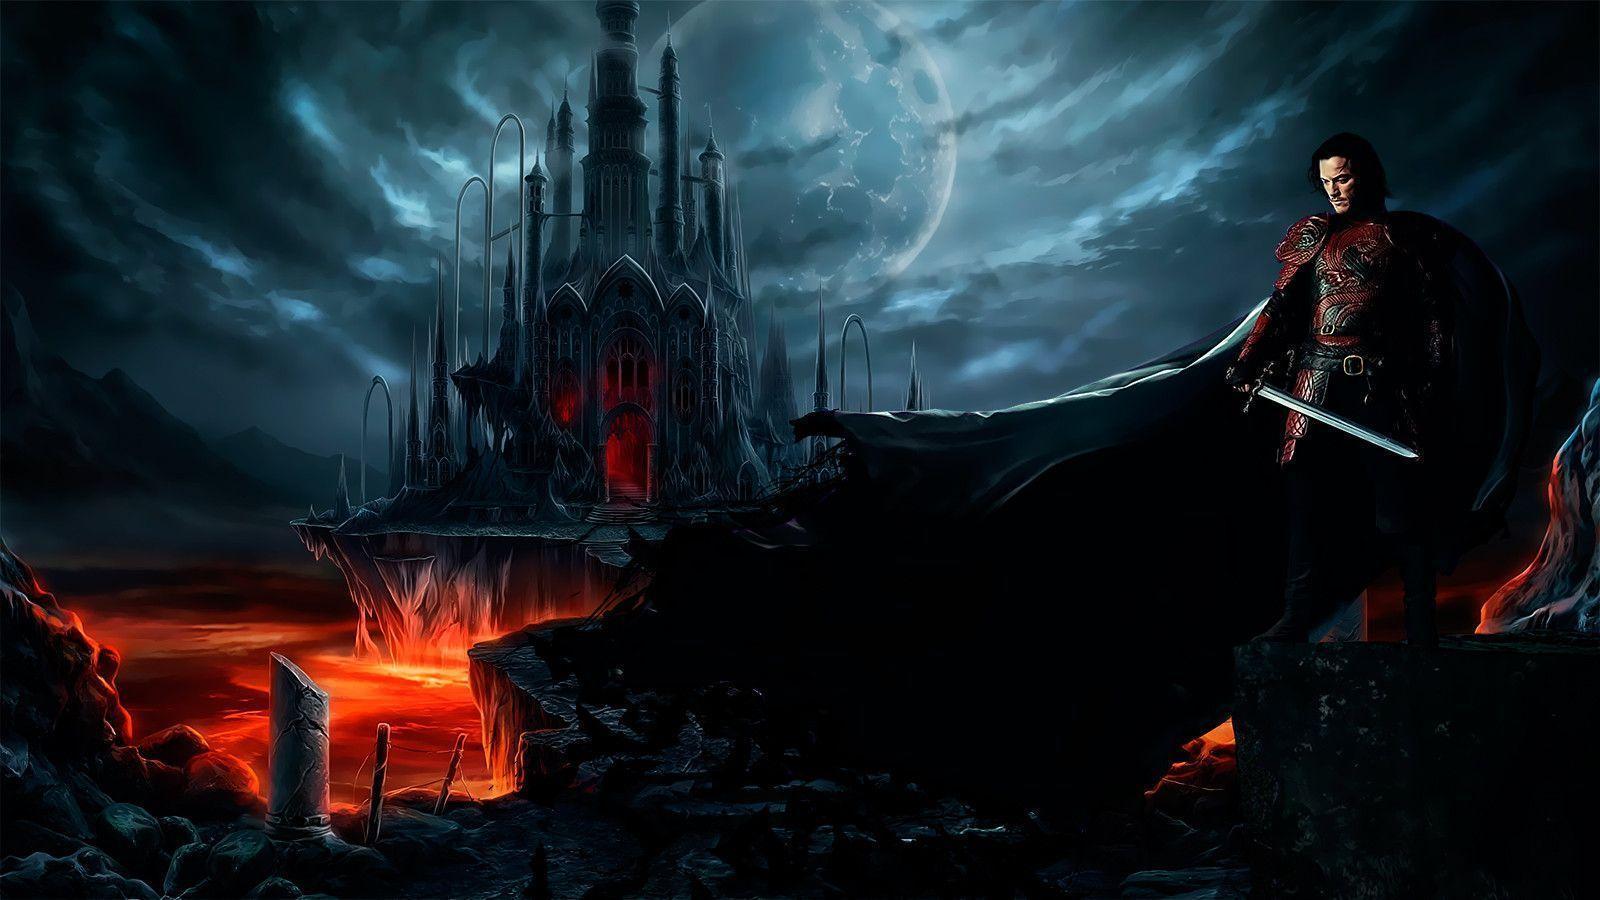 Dracula Wallpapers Top Free Dracula Backgrounds Wallpaperaccess